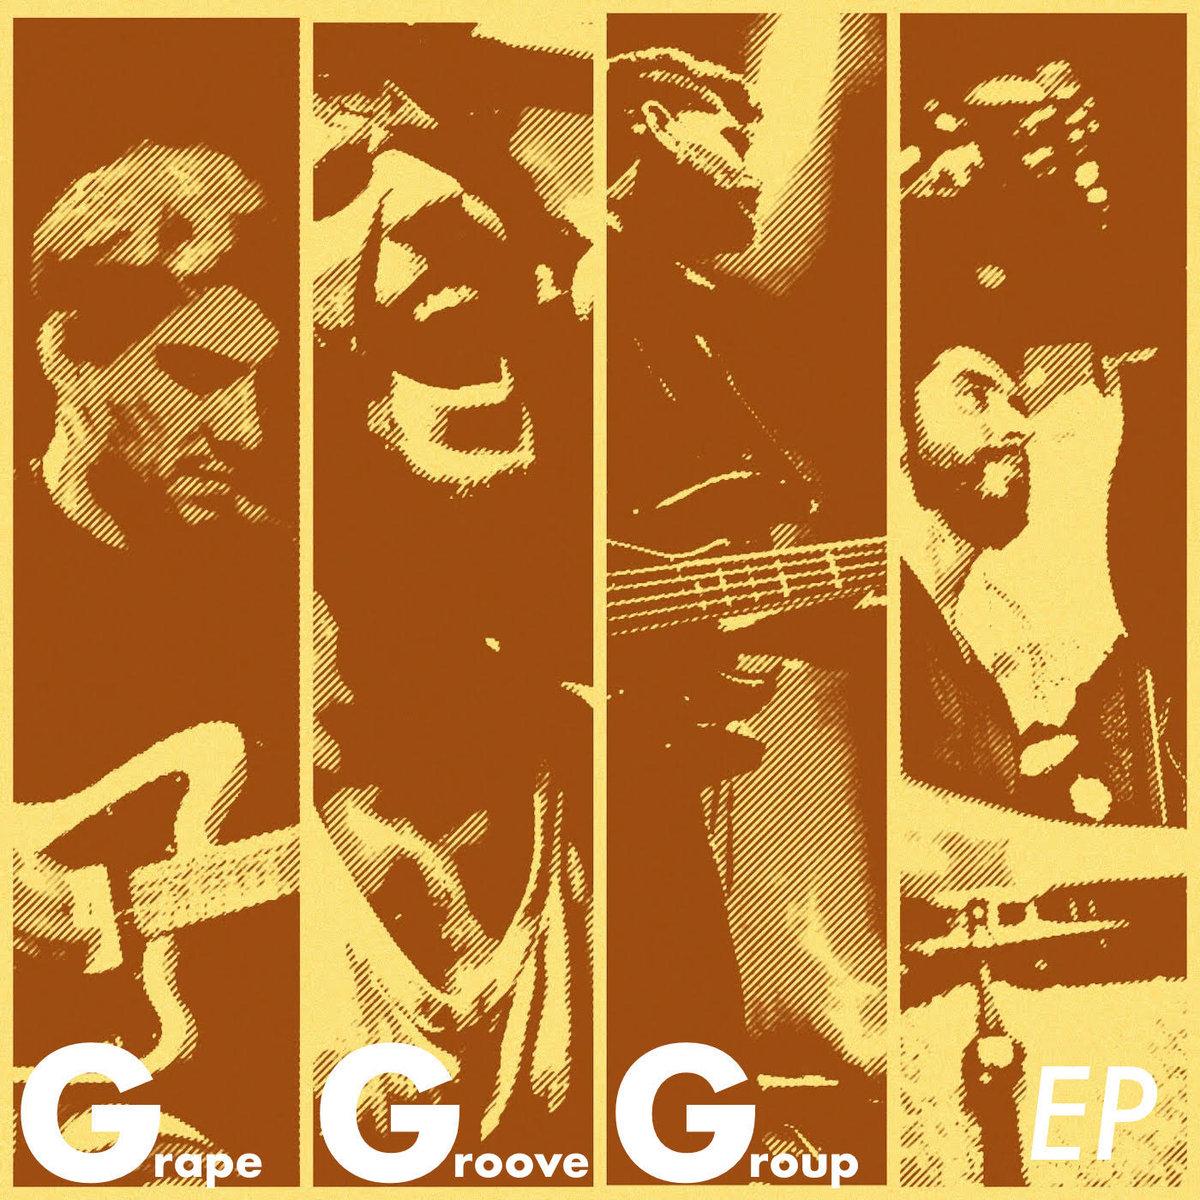 GRAPE GROOVE GROUP https://grapegroovegroup.bandcamp.com